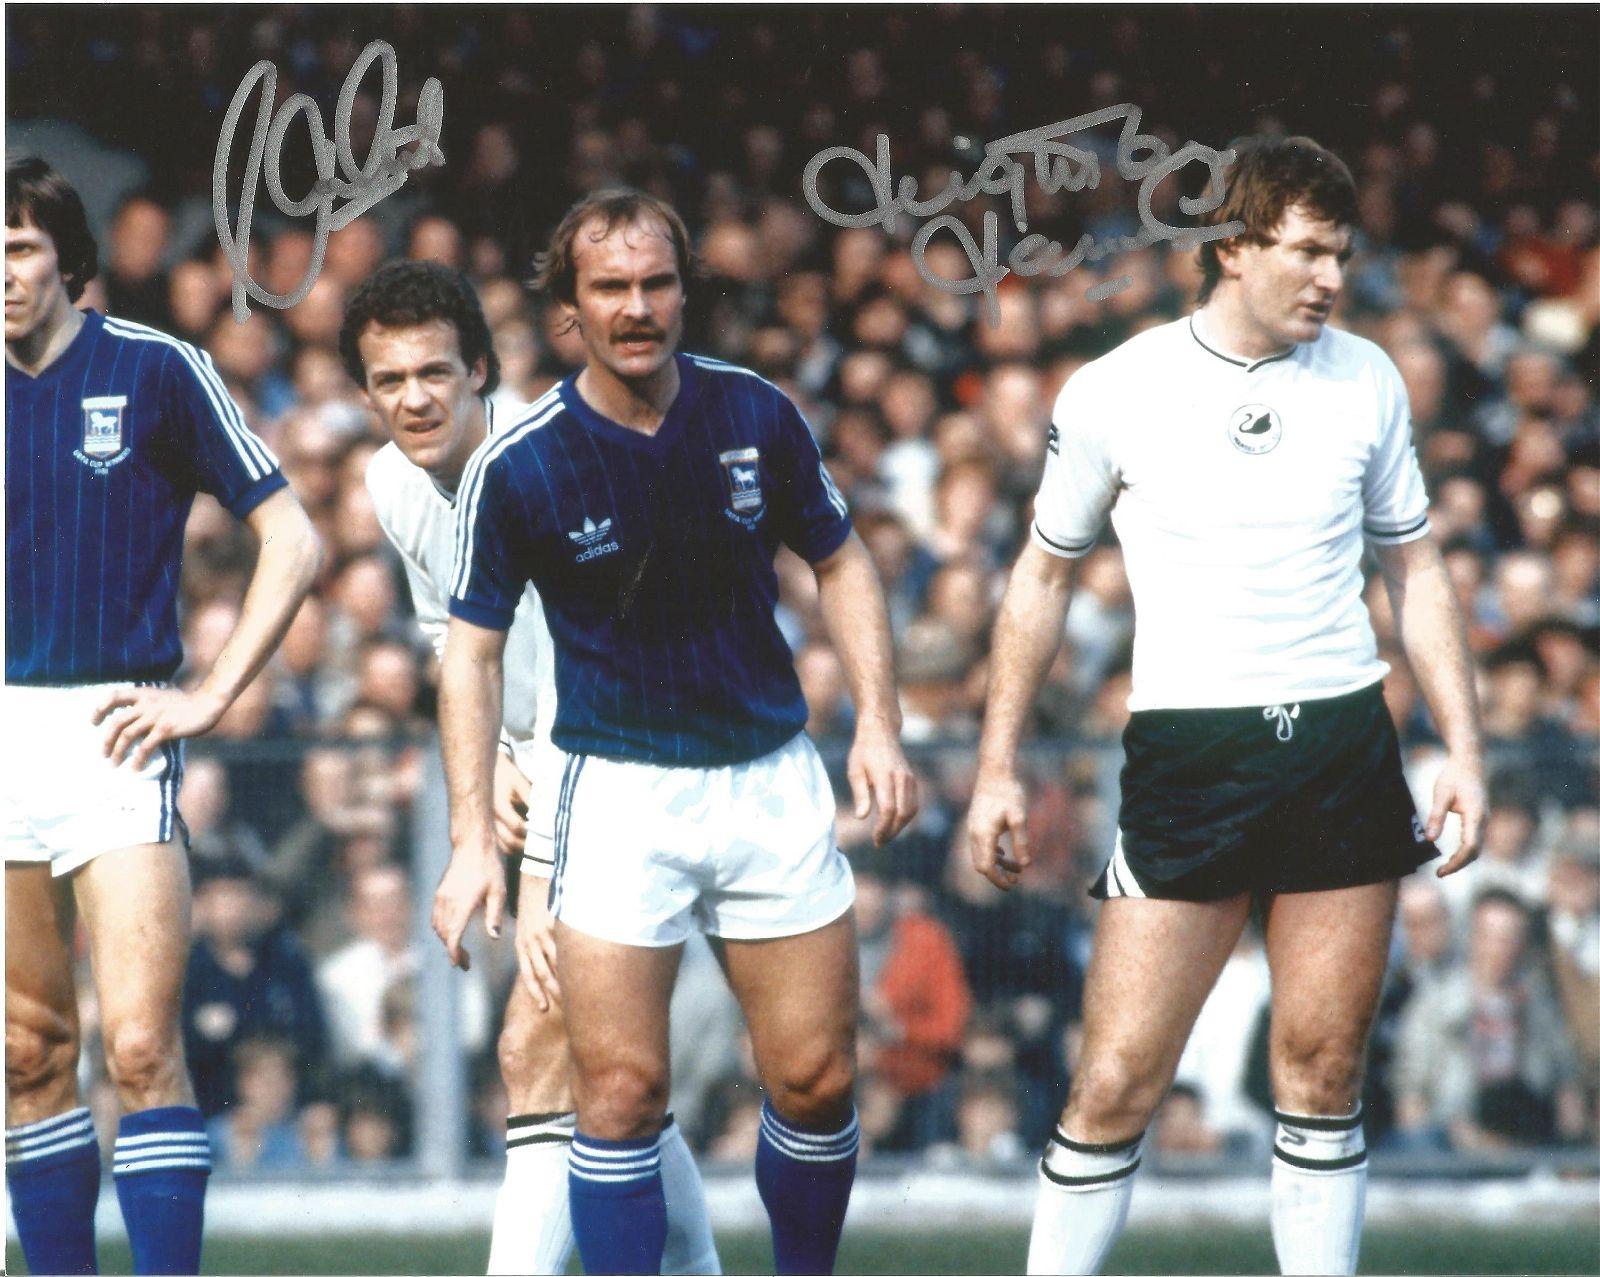 Football Alan Curtis and Leighton James signed 10x8